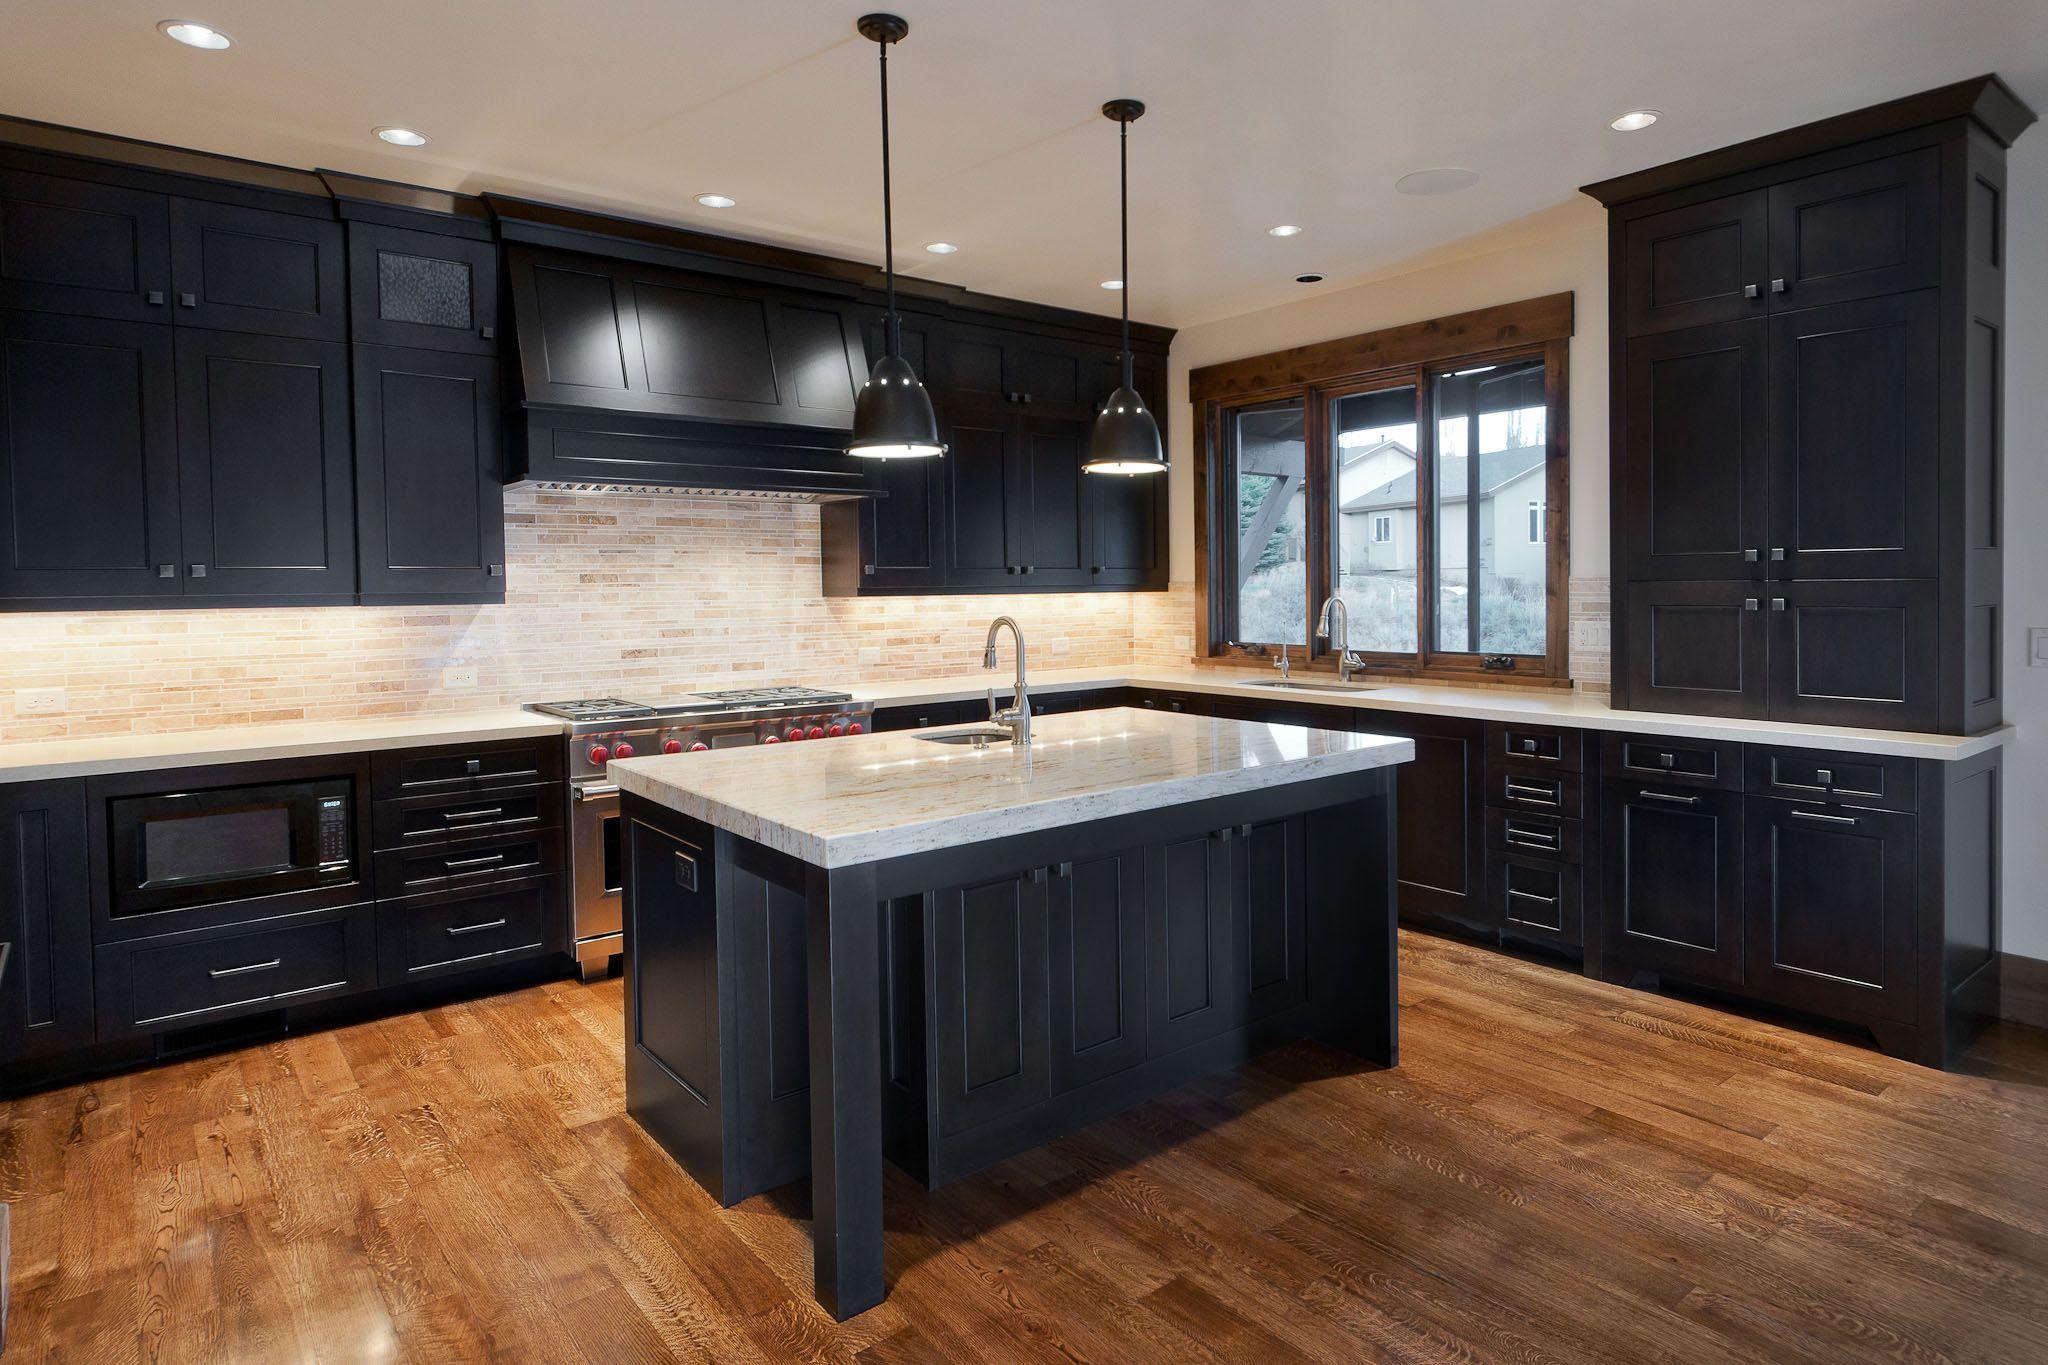 Paint kitchen cabinets espresso color for Cappuccino color kitchen cabinets